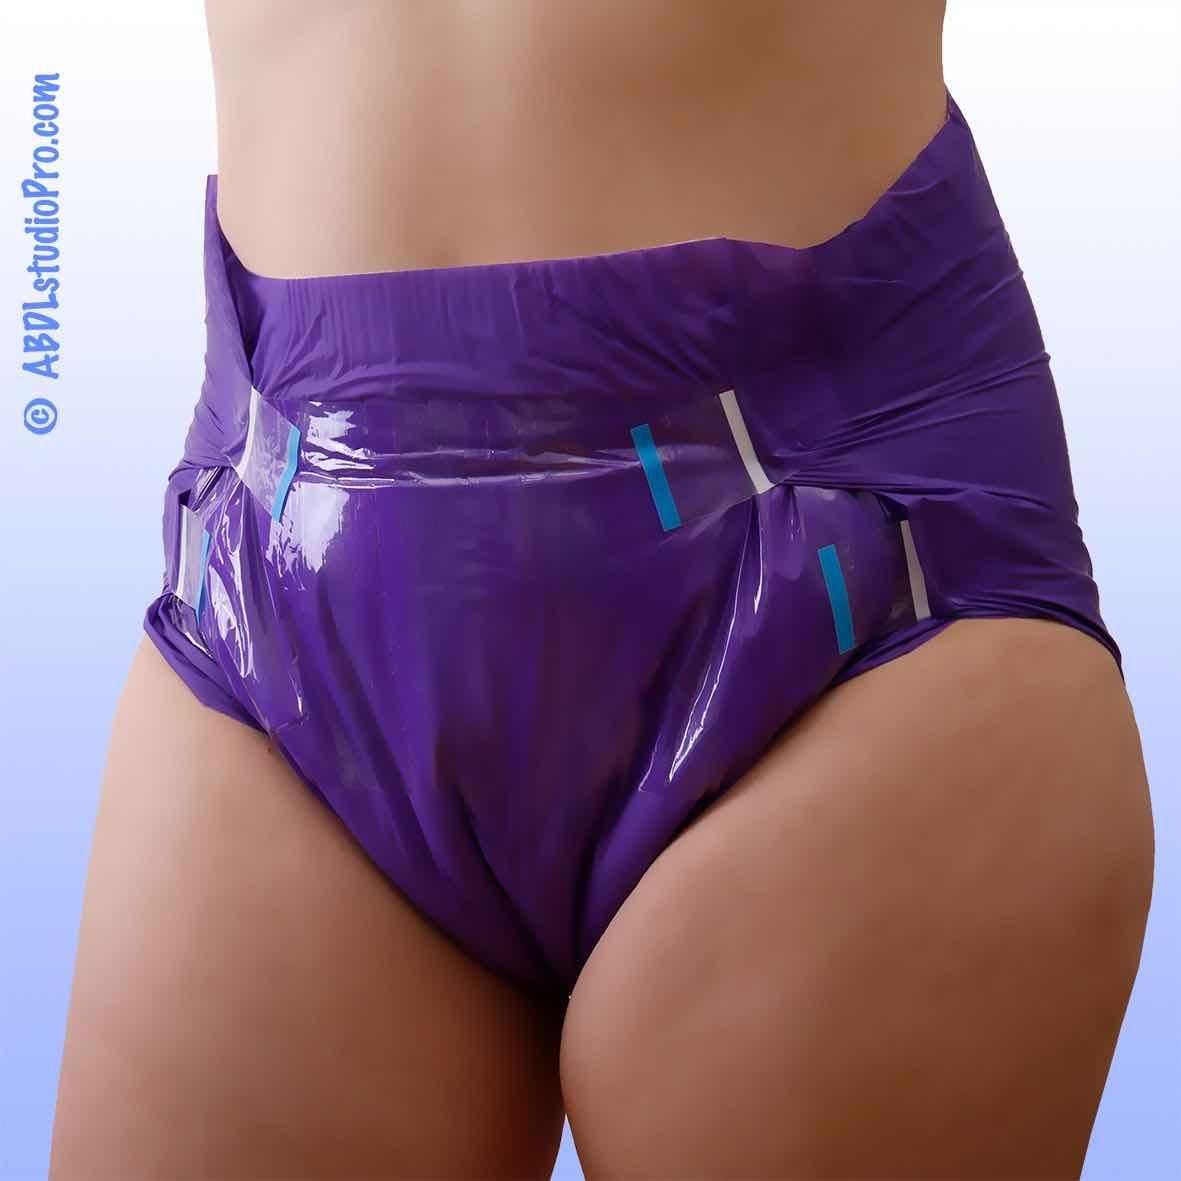 Seduction Windelhose medium Violet , Einzelstueck